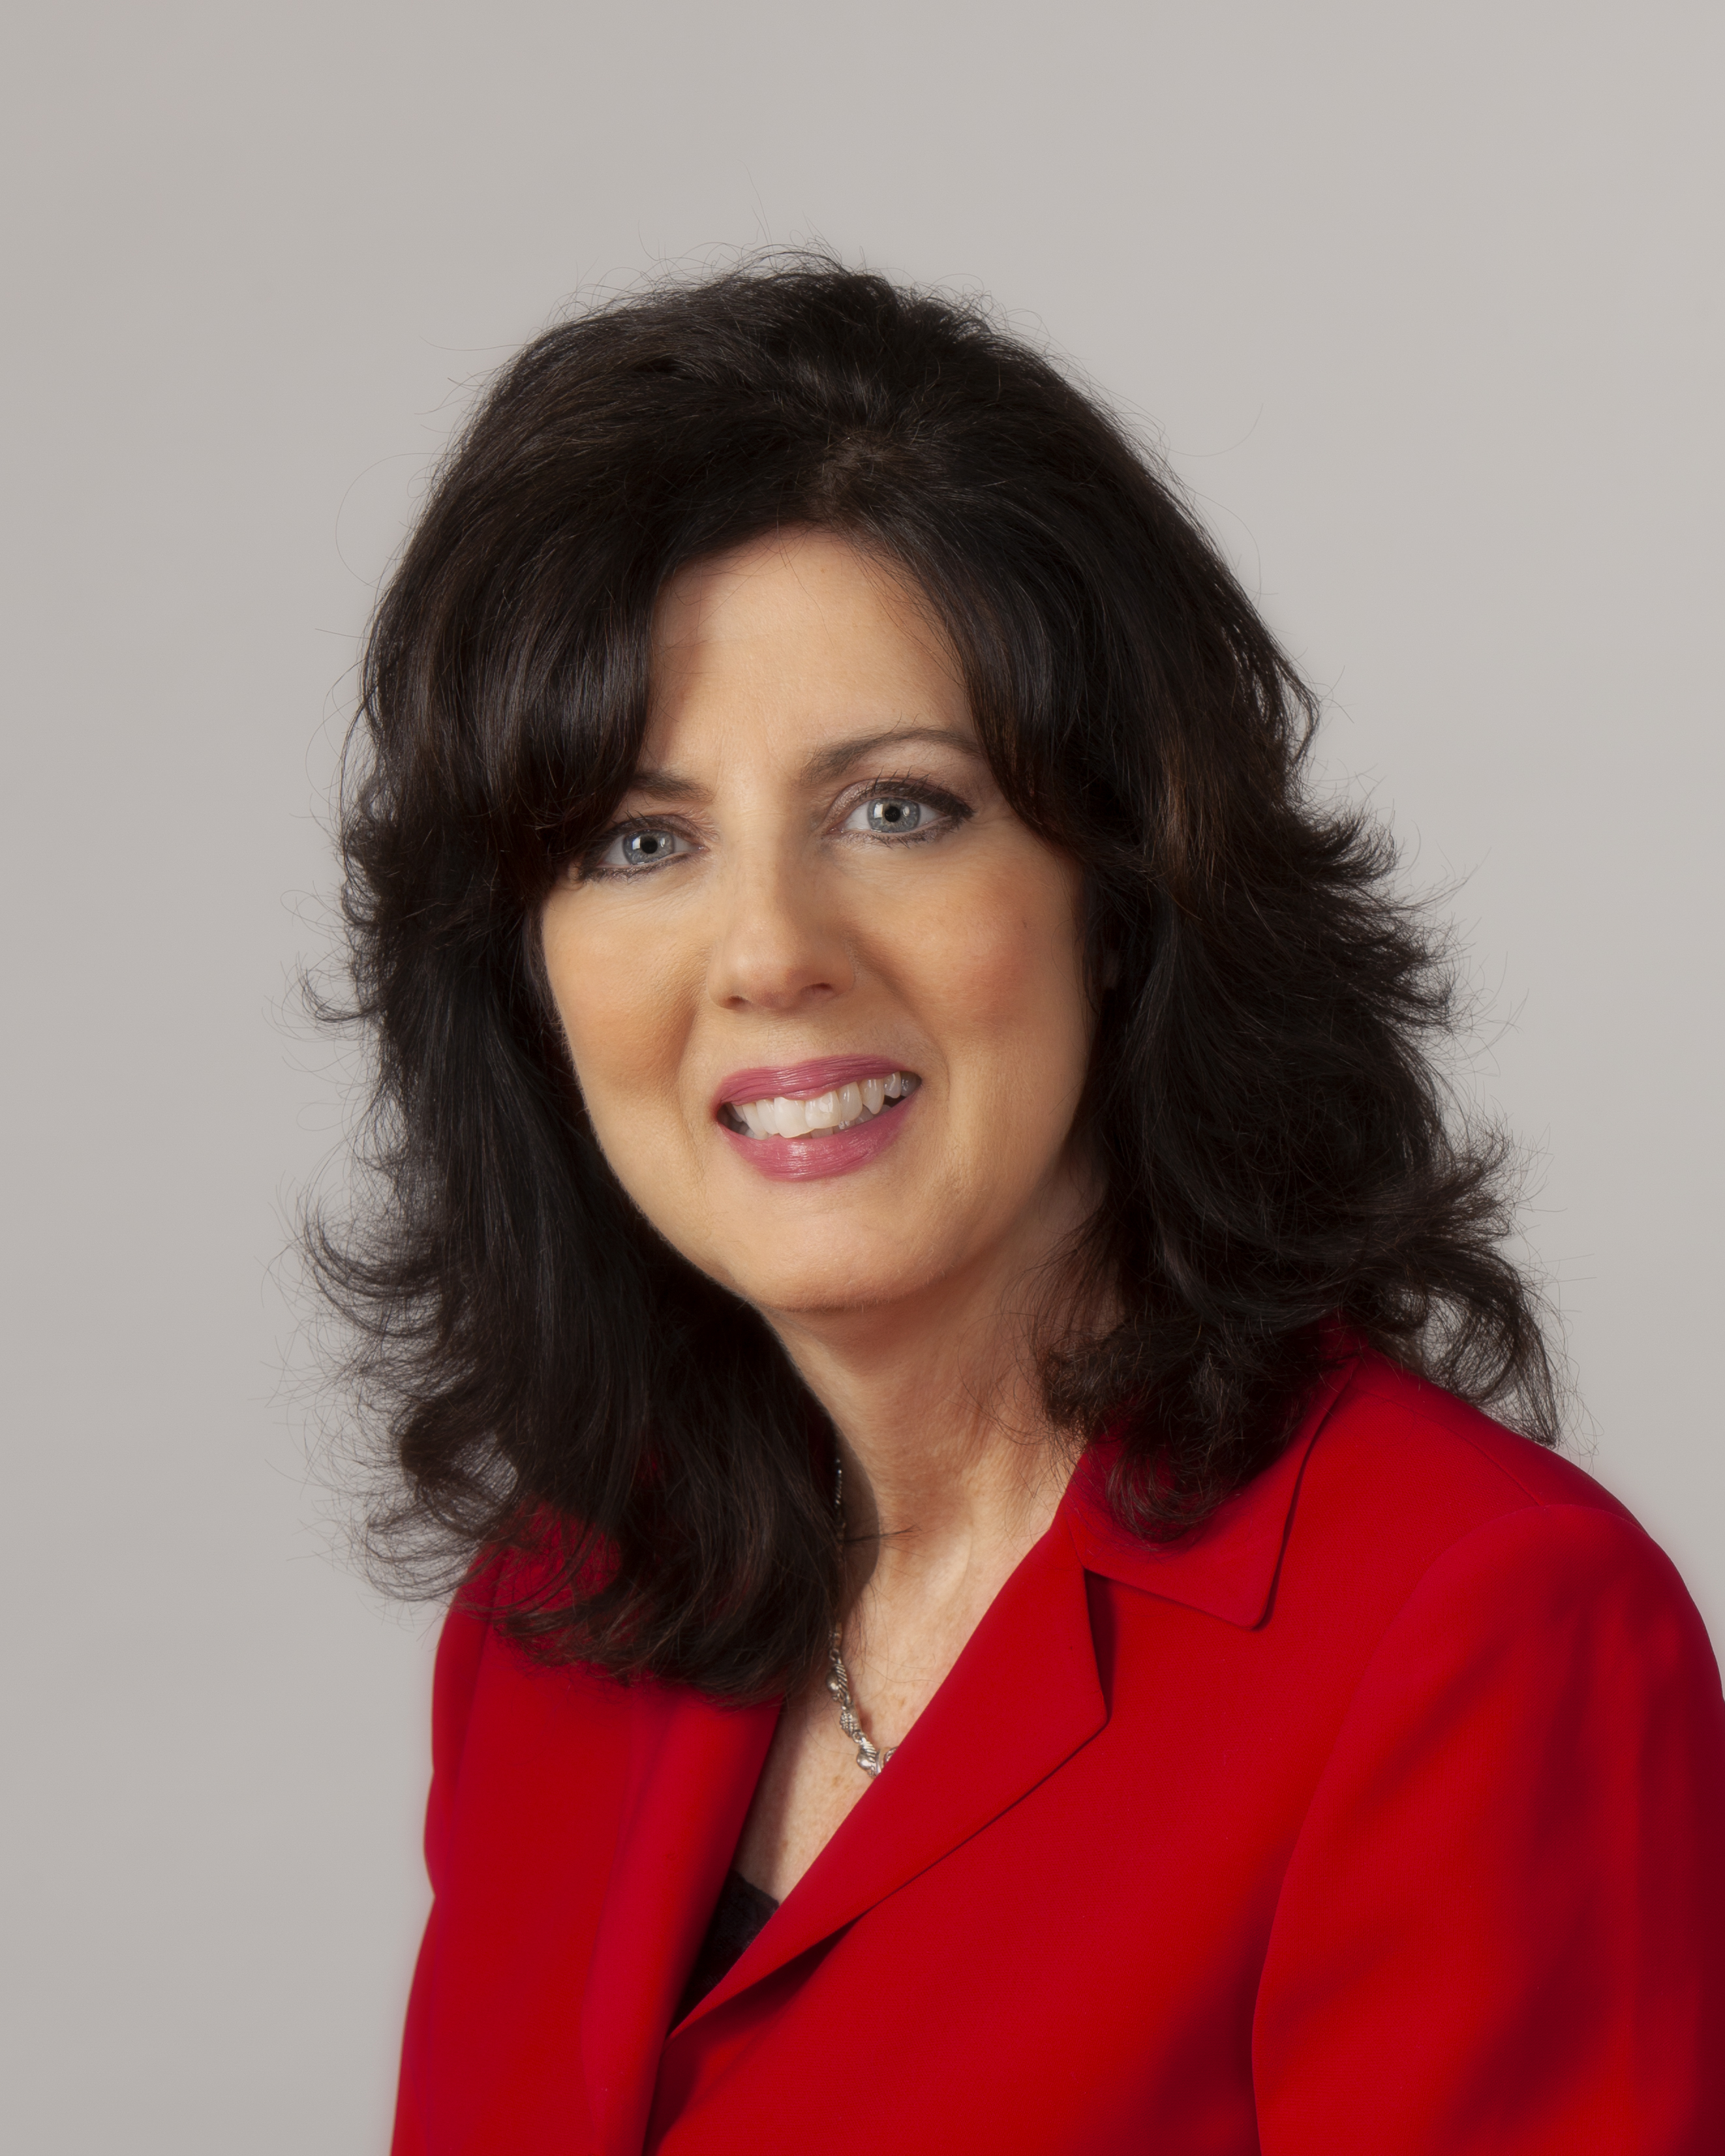 Rhonda Strouble, Real Estate Broker NWI